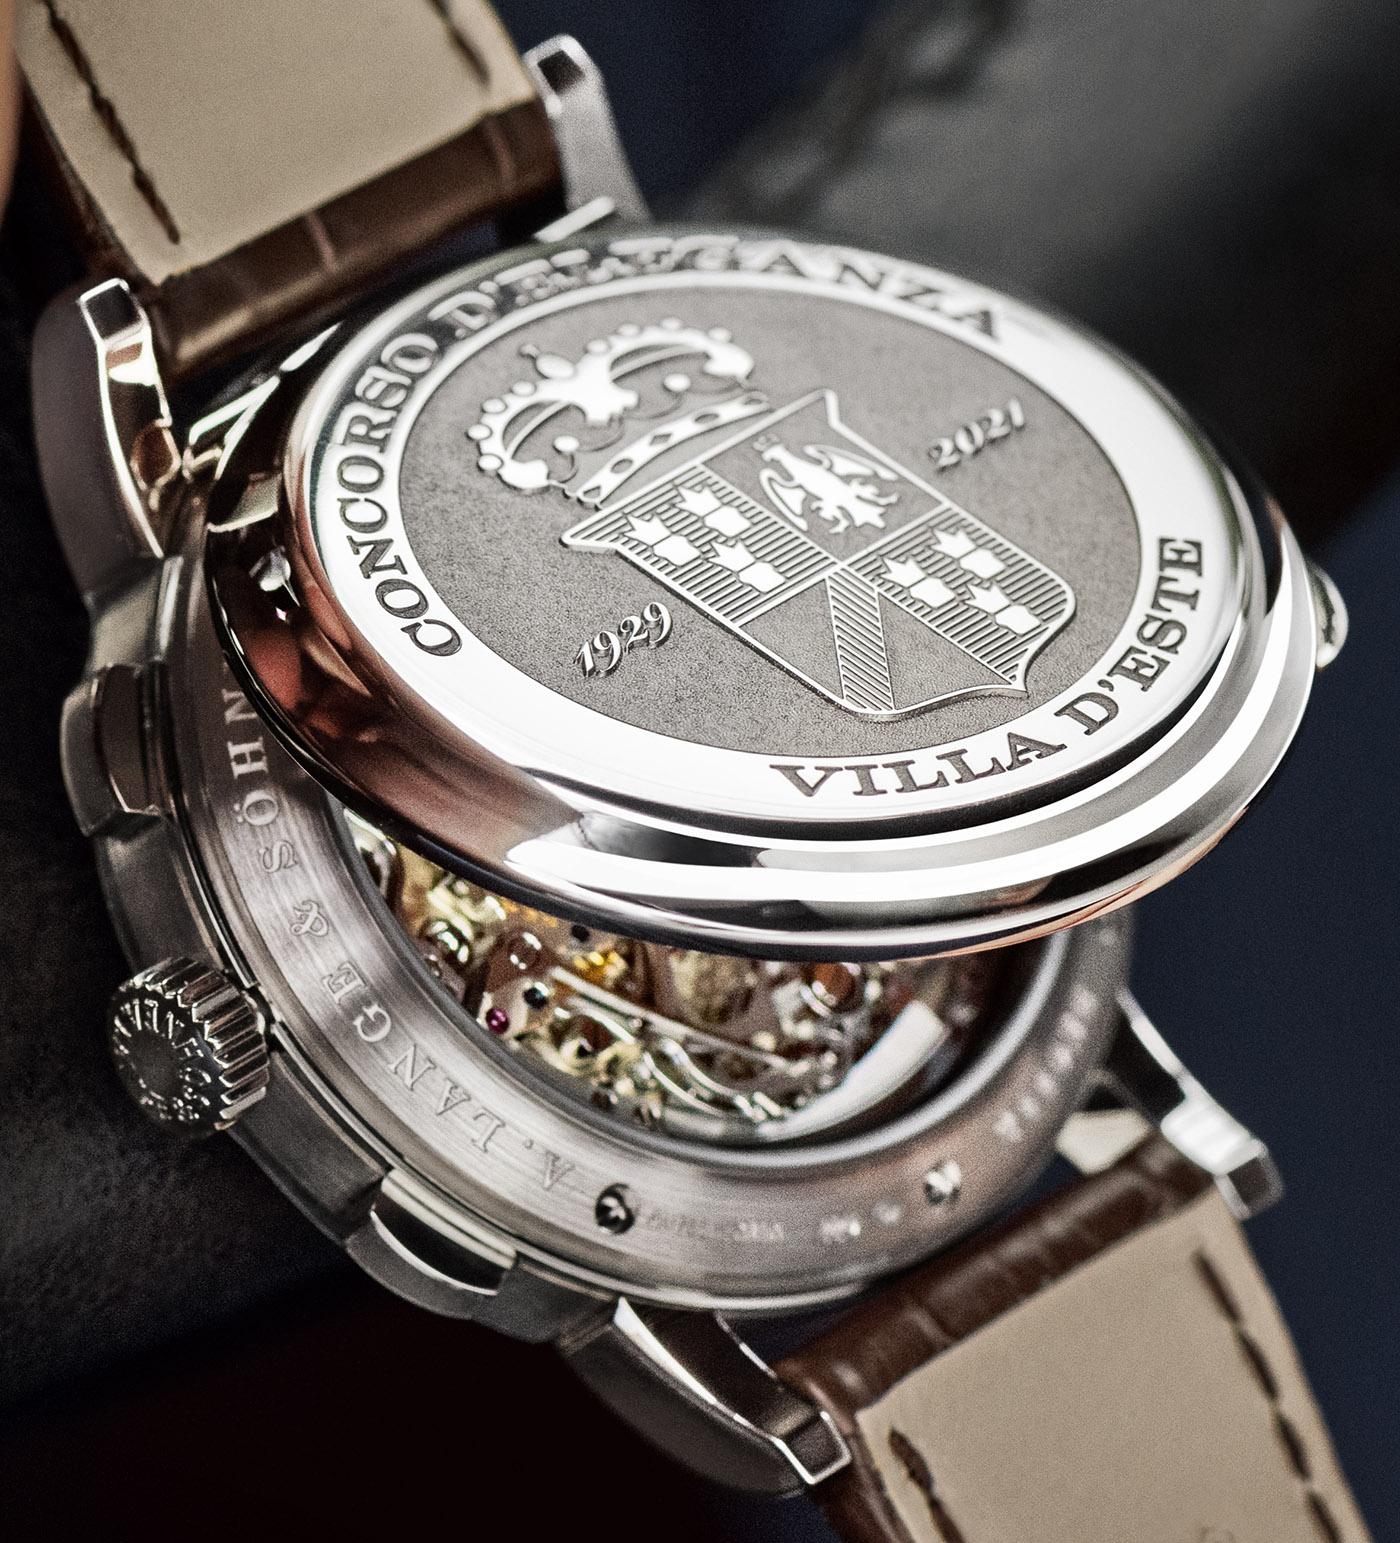 A. Lange & Söhne представляет уникальные часы 1815 Chronograph Concorso Edition